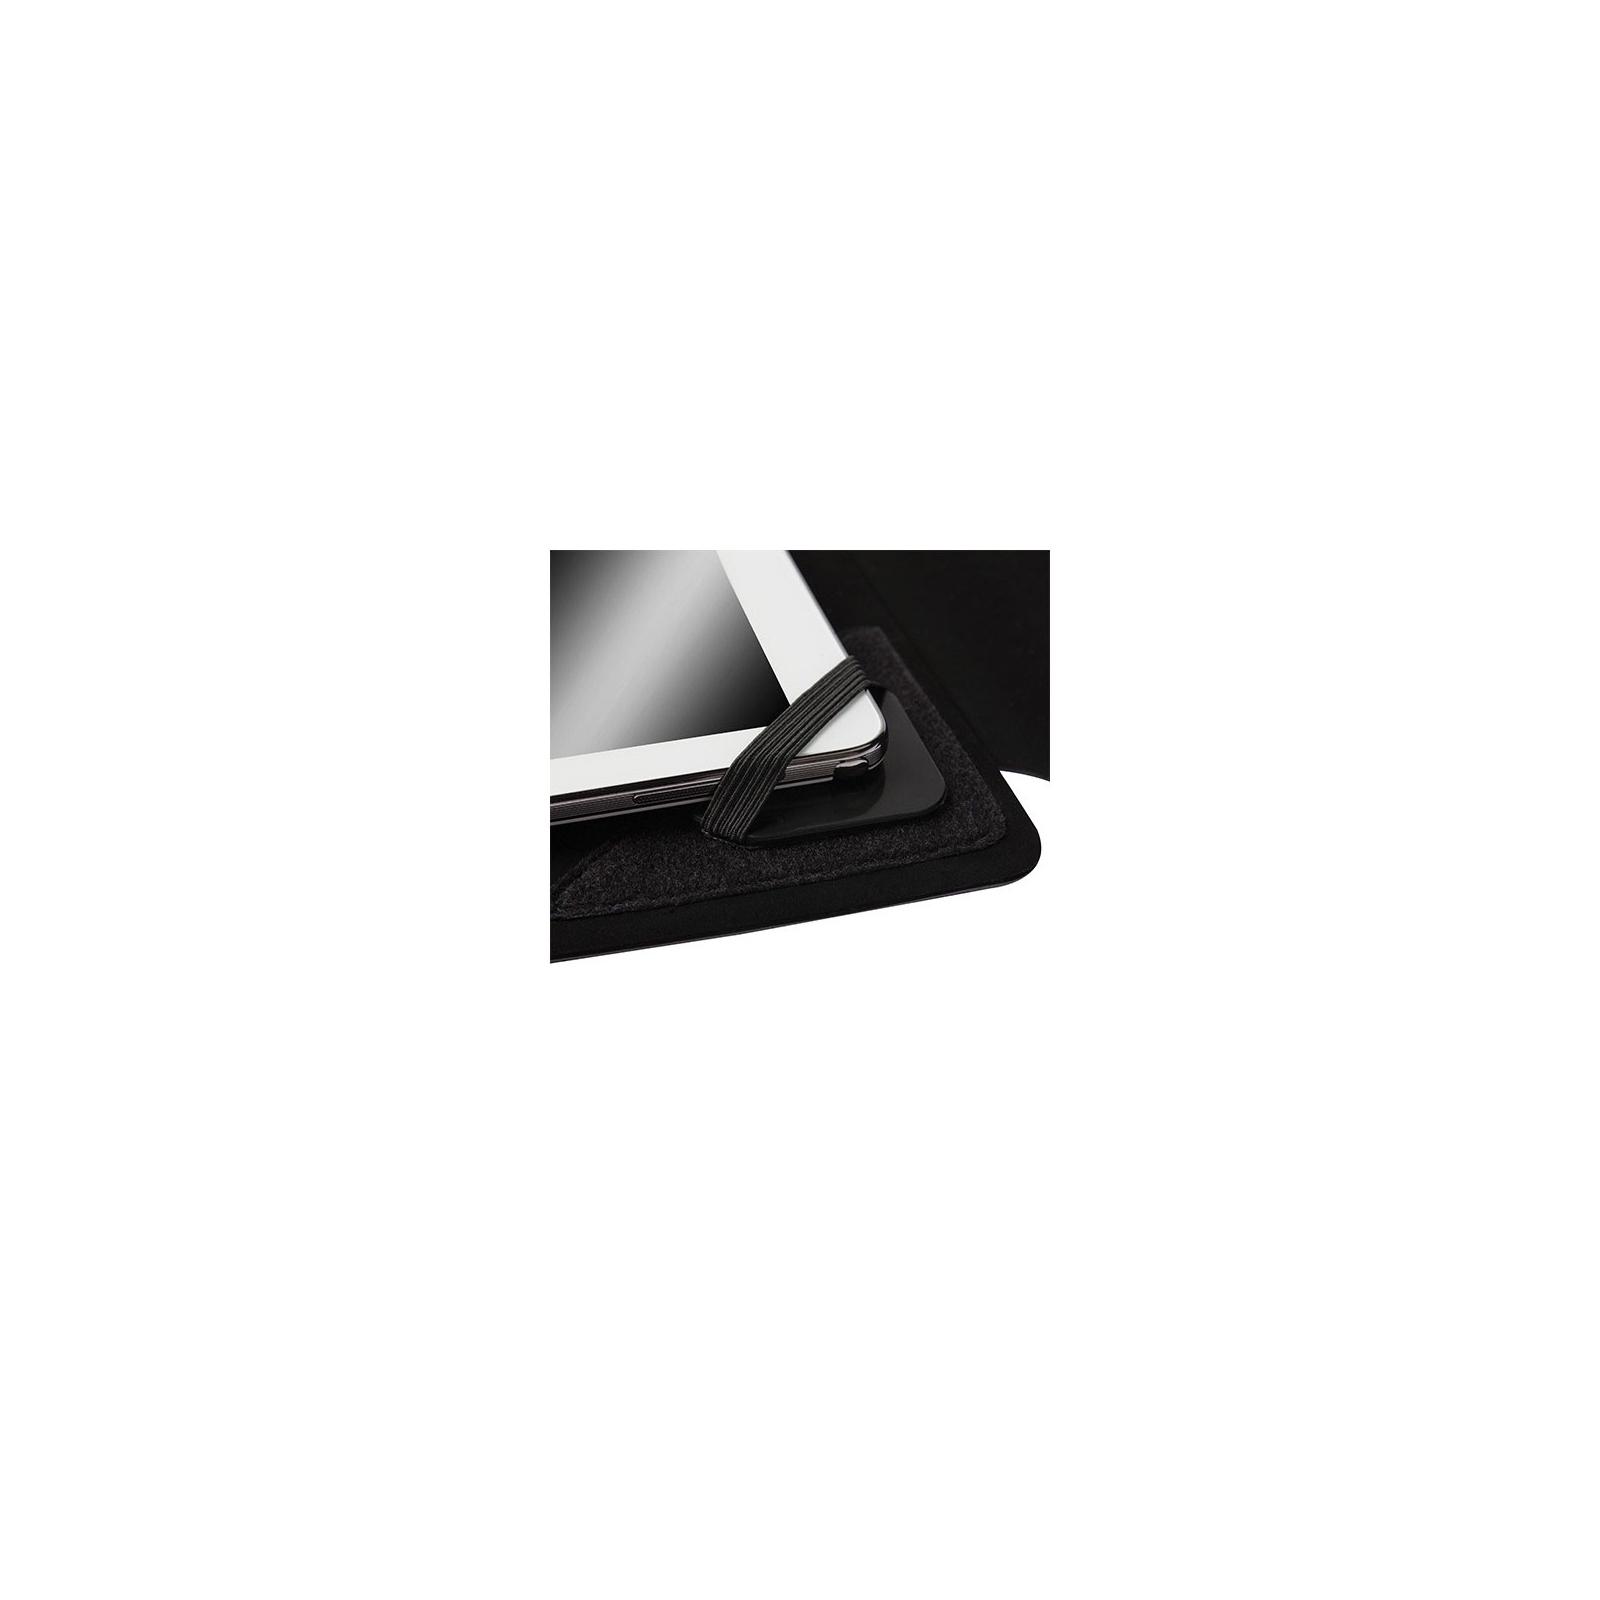 Чехол для планшета Krusell 6-7.9'' Dons Universal Black (71330) изображение 5